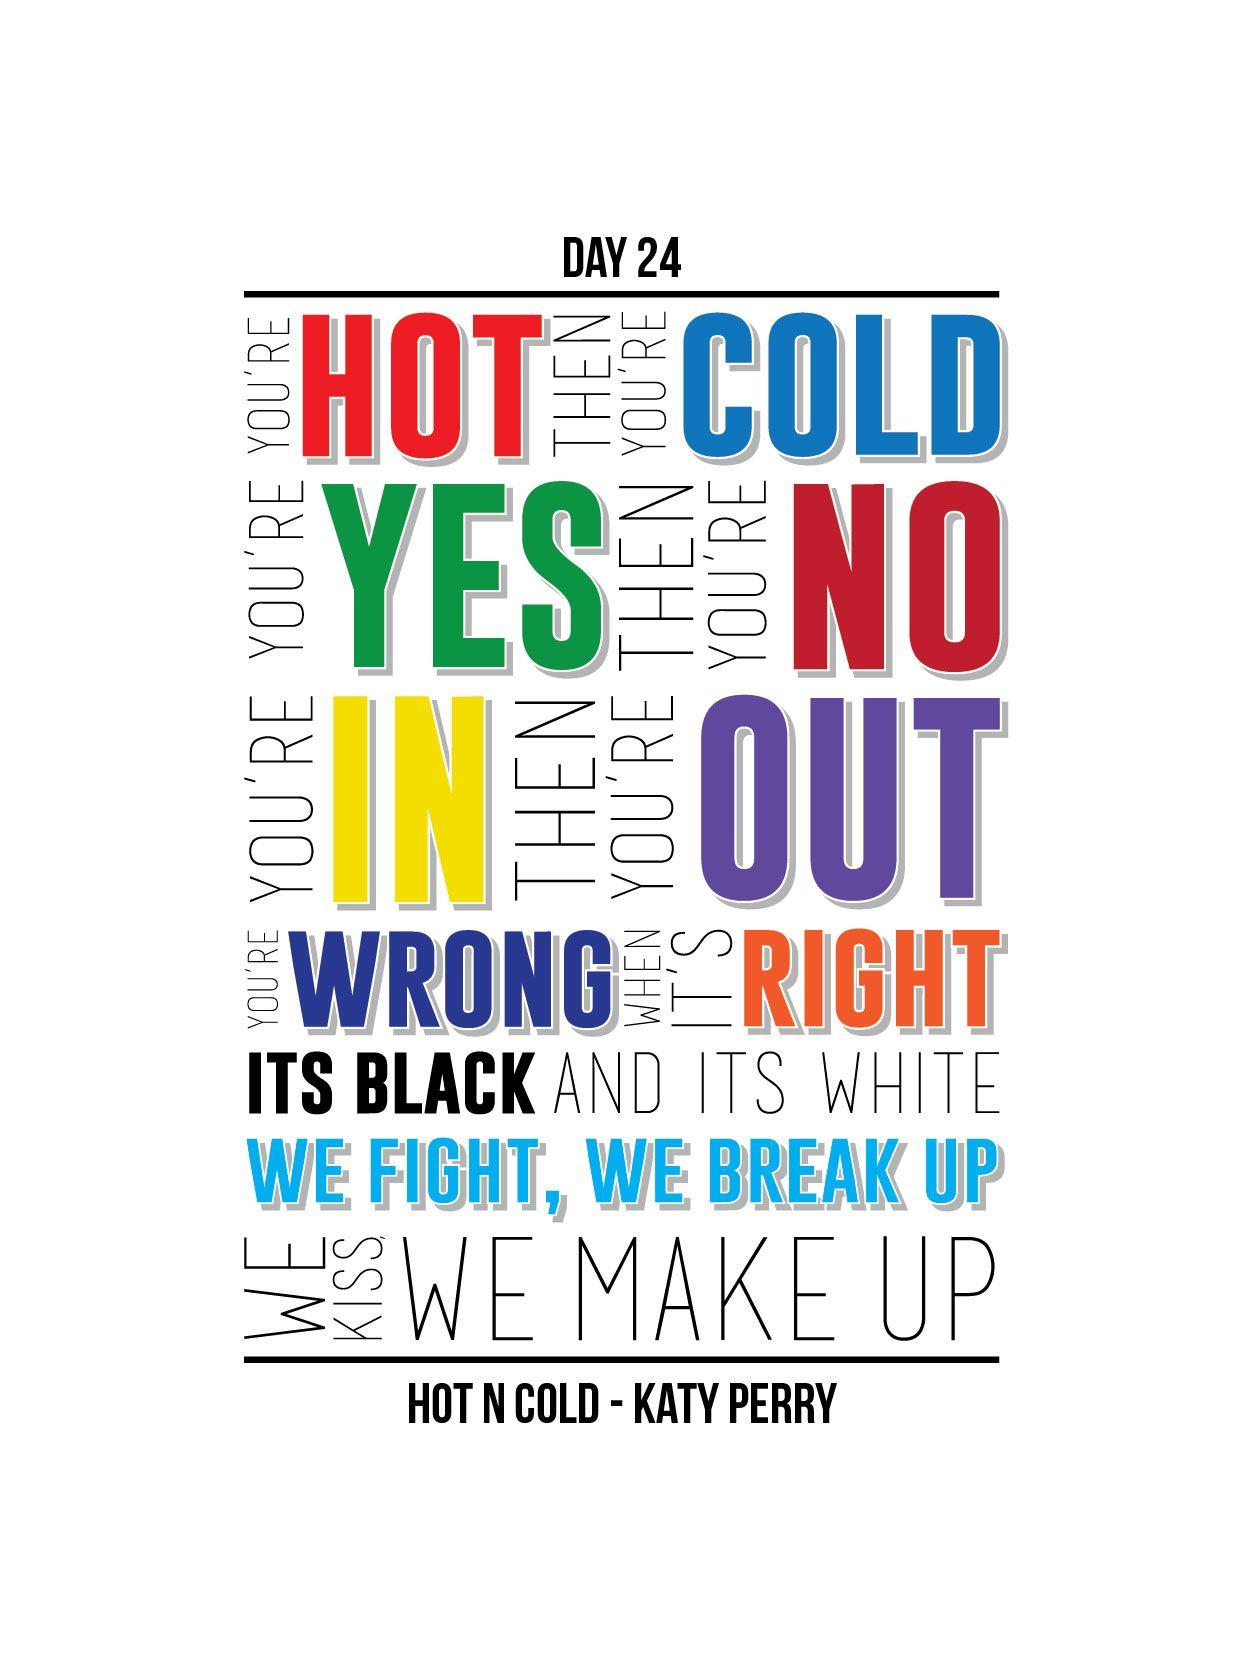 Plastic bag katy perry lyrics - Day 24 Hot N Cold 30 Days Of Lyrical Typography Http Katy Perry Lyricslyric